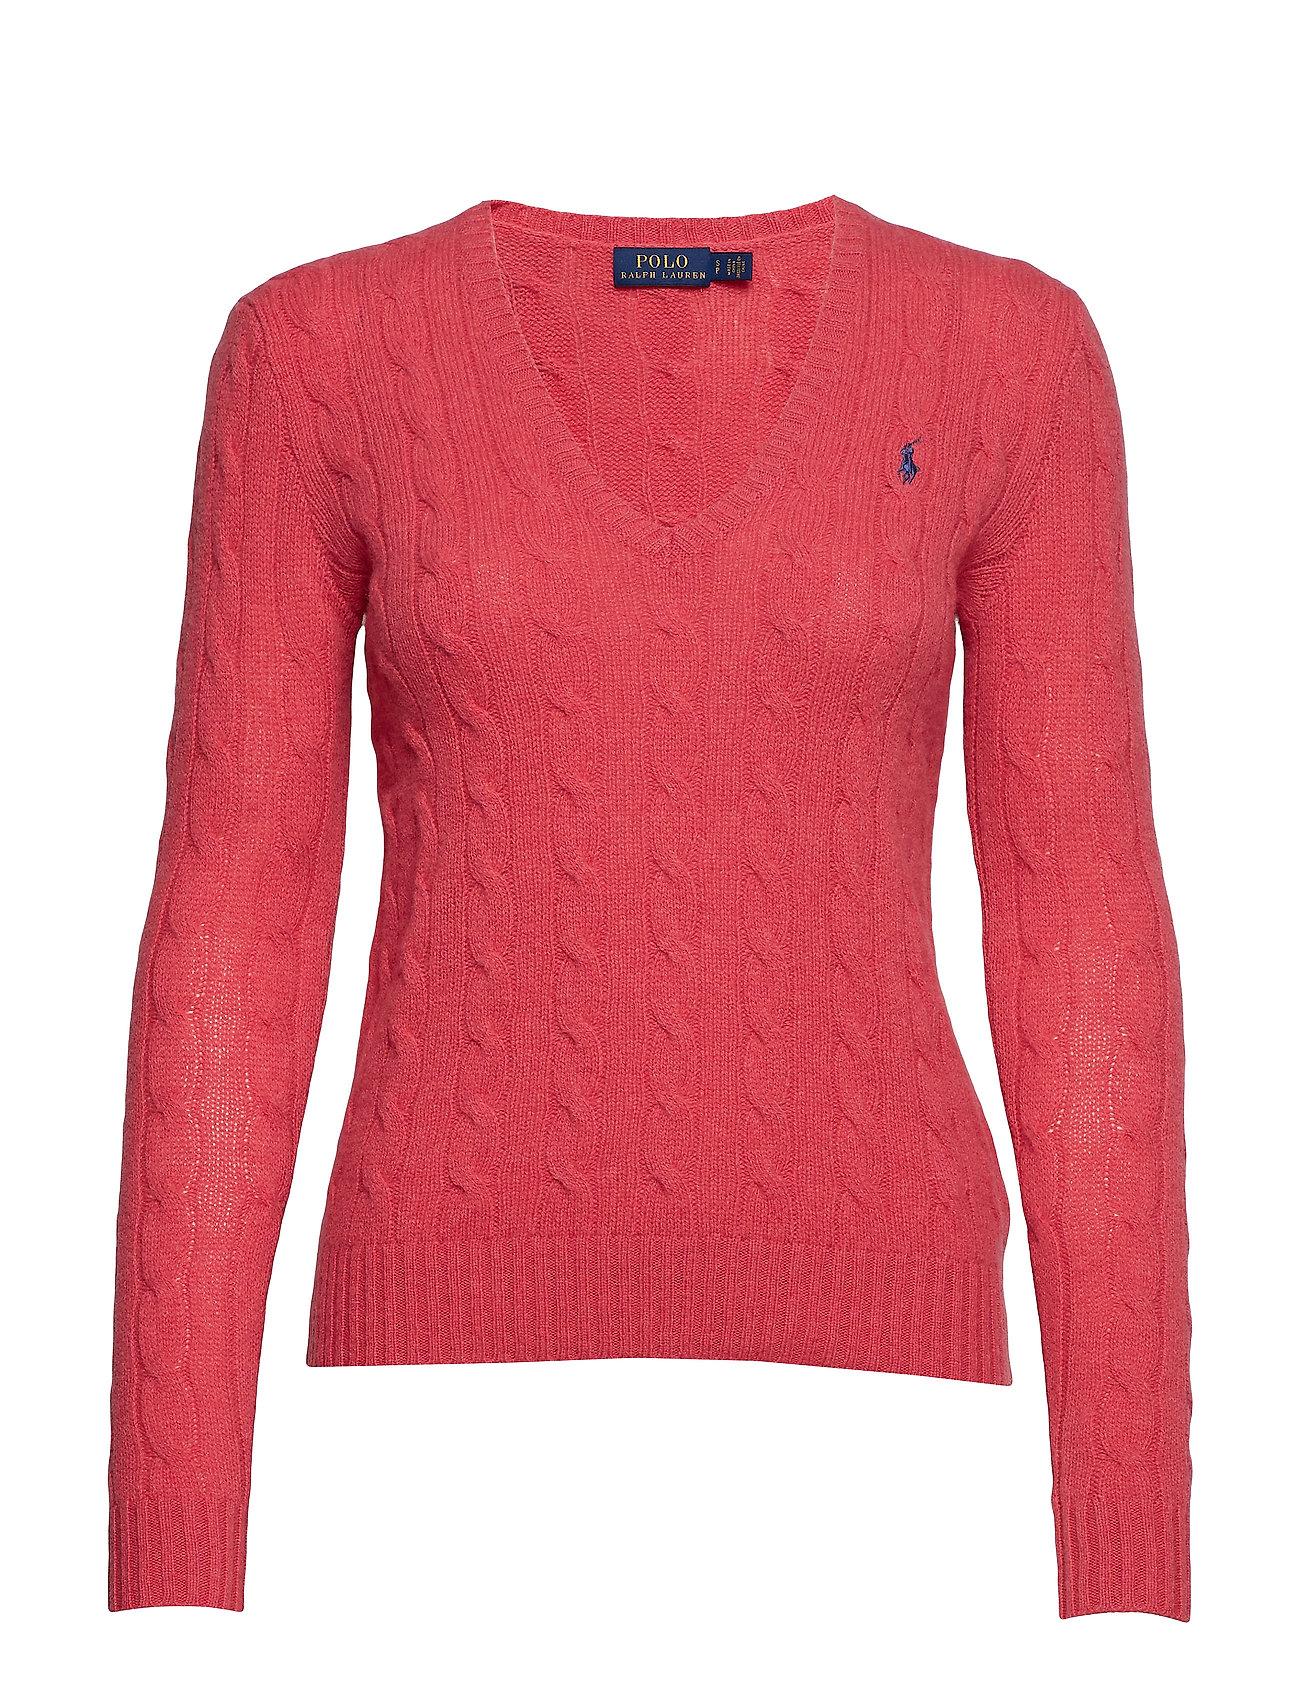 Polo Ralph Lauren Cable Wool-Cashmere Sweater - GERANIUM HEATHER